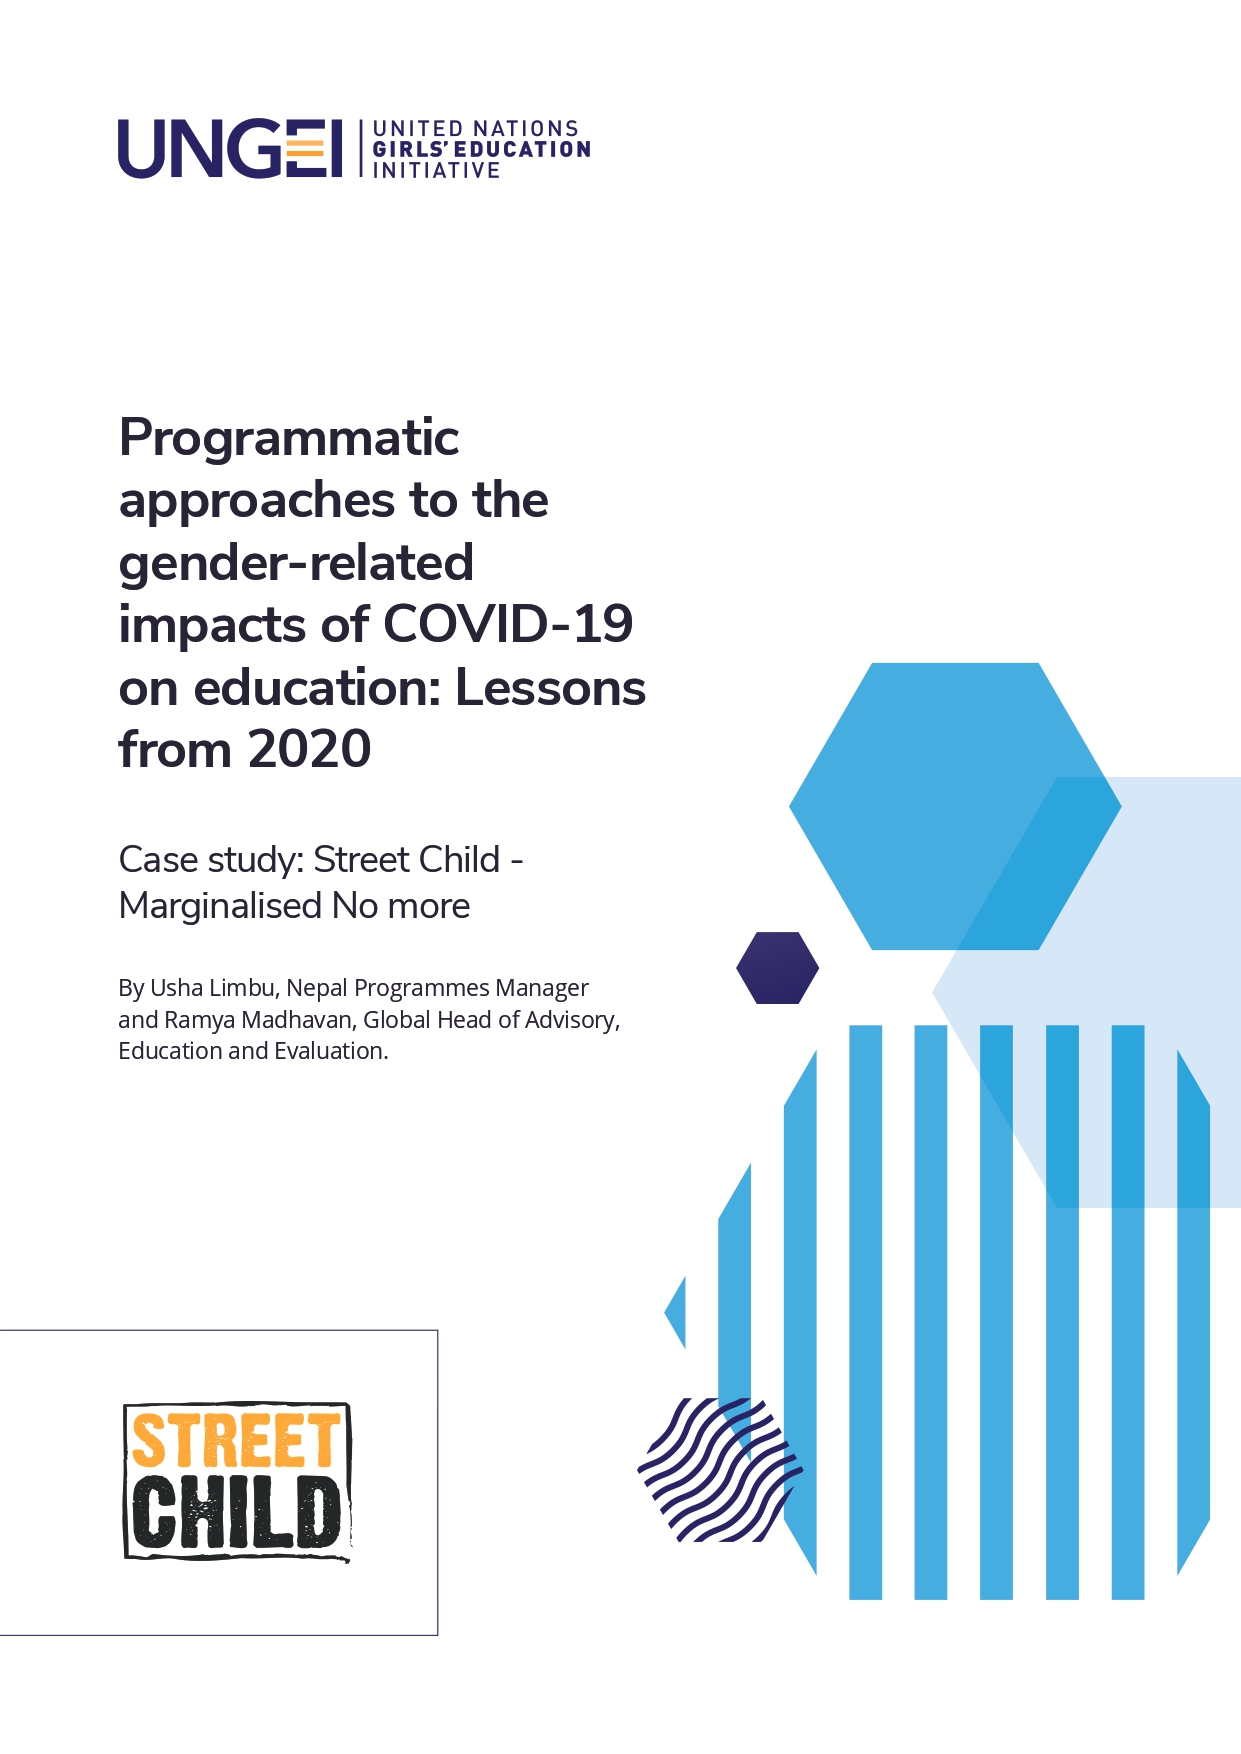 Case study: Street Child - Marginalised No more